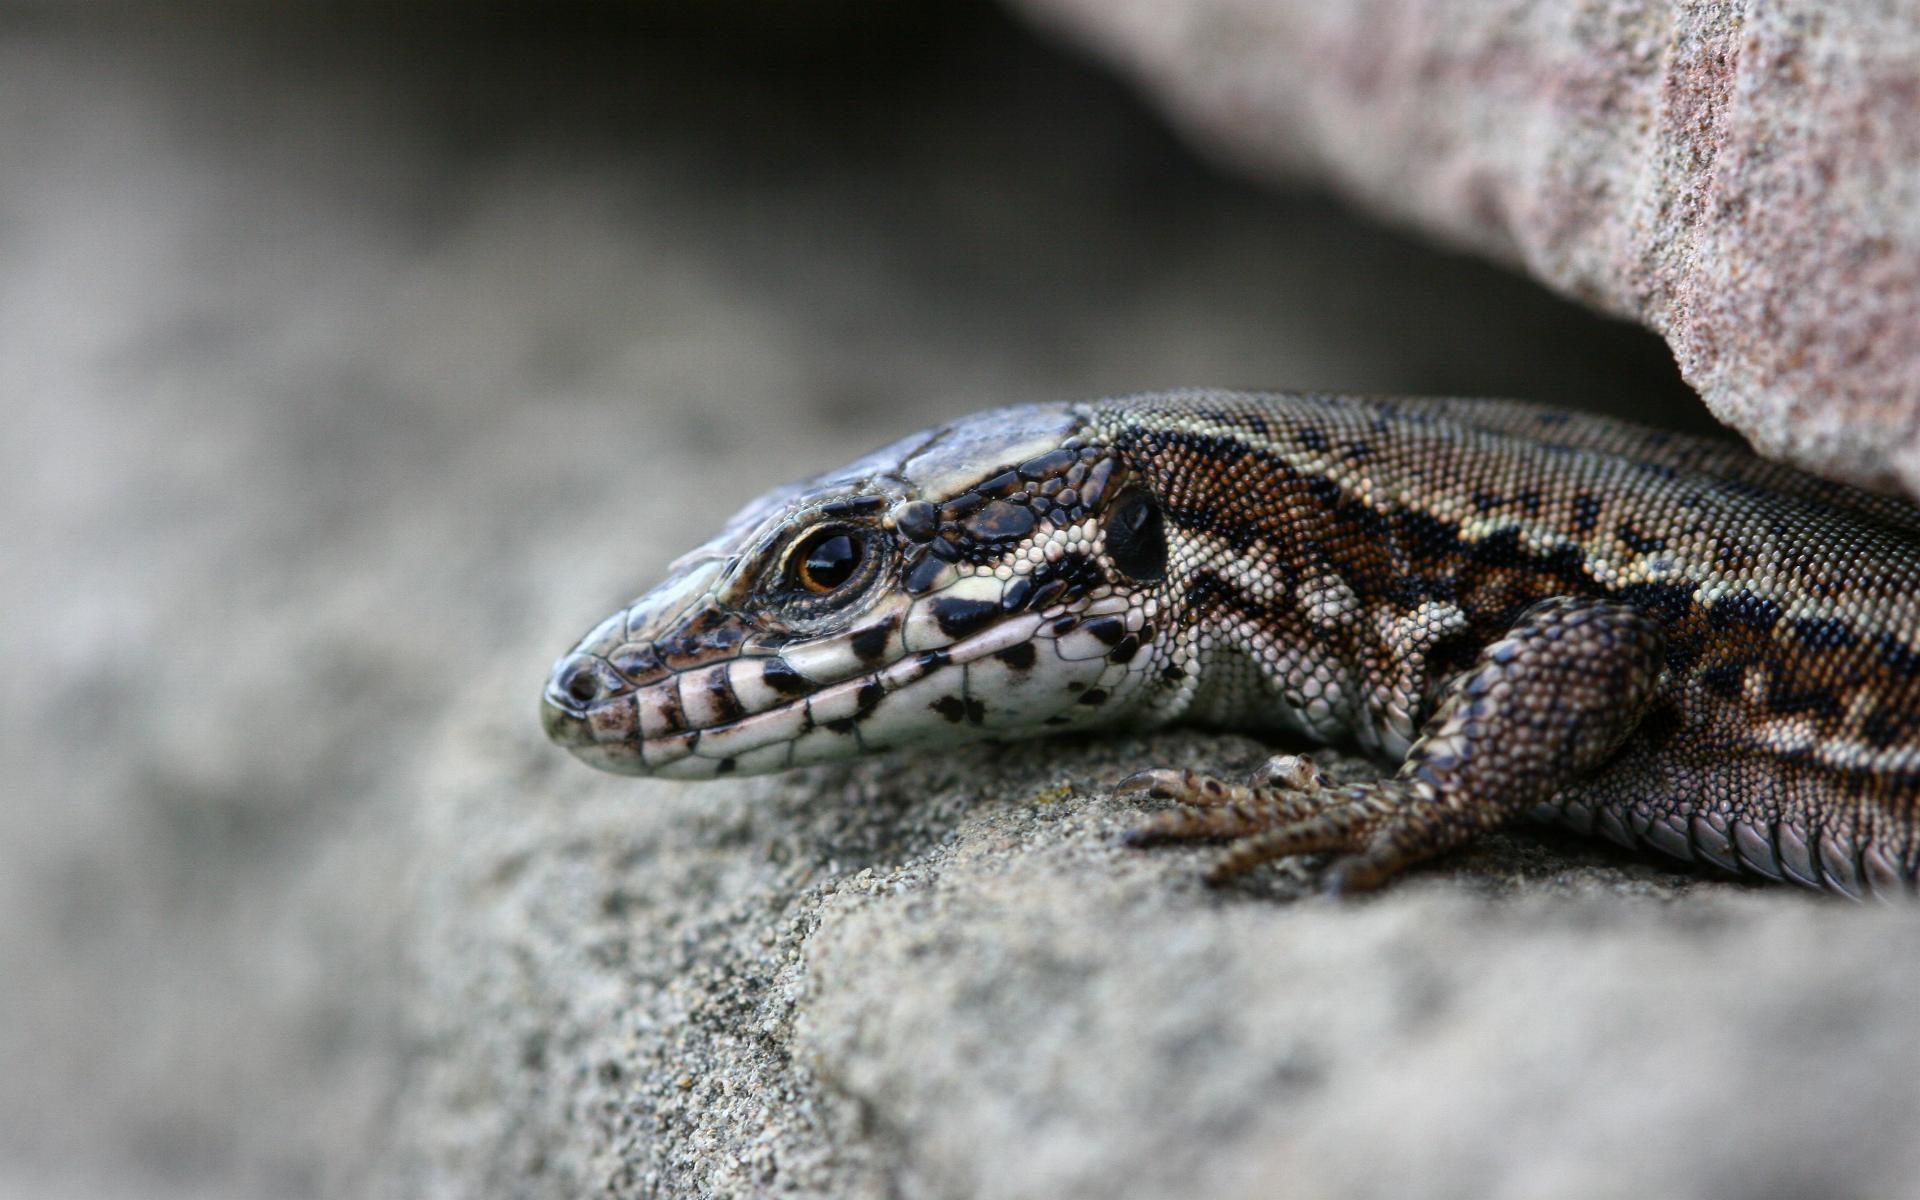 lizard wallpapers photos and desktop backgrounds up to 8K